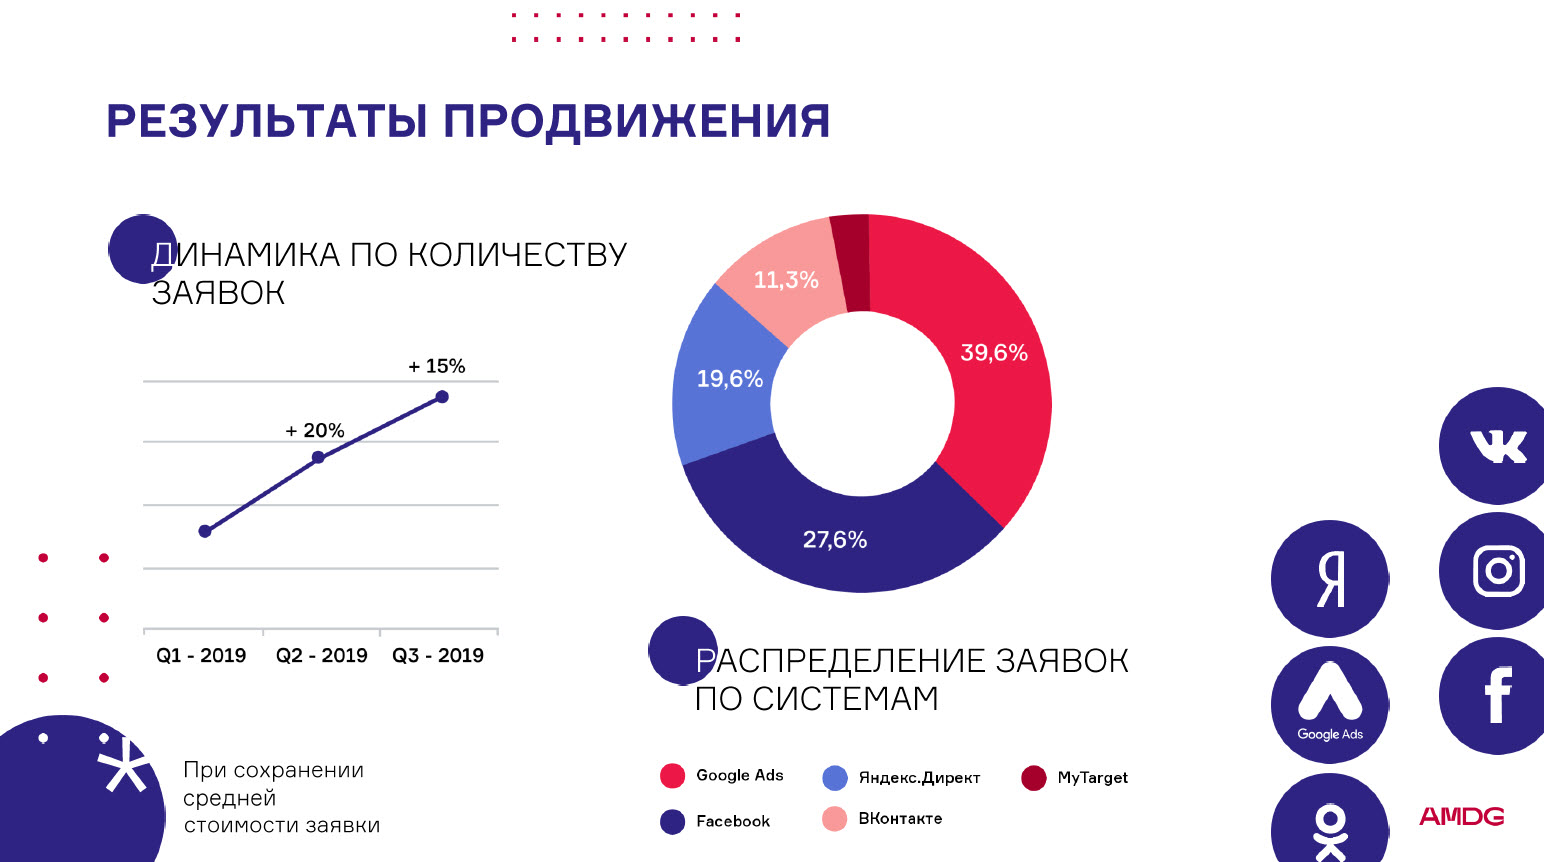 Material from the presentation of Sergei Kazak